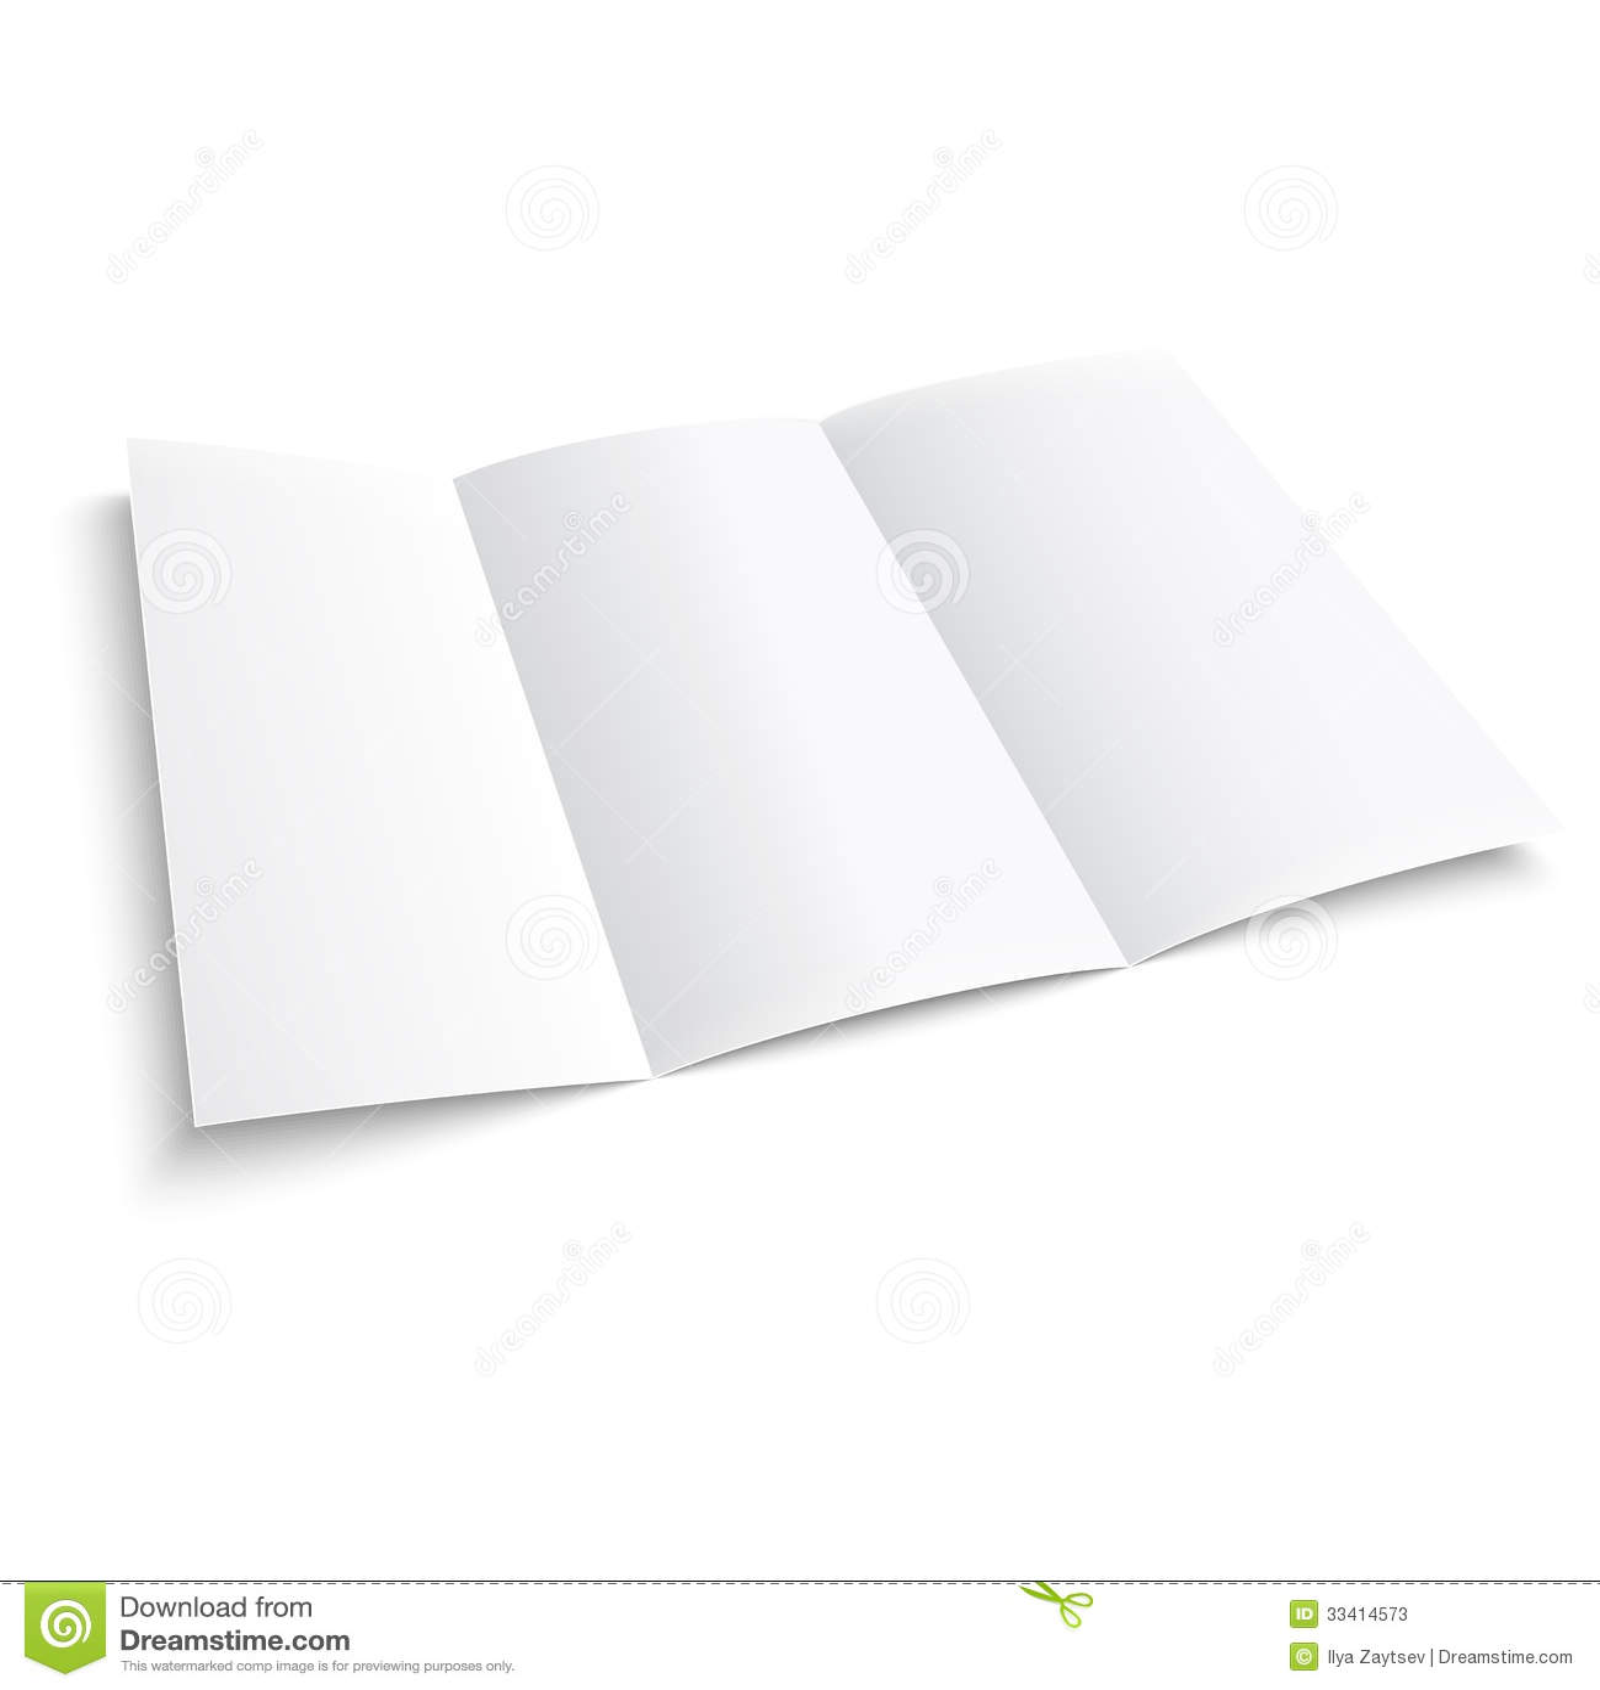 tri folded paper